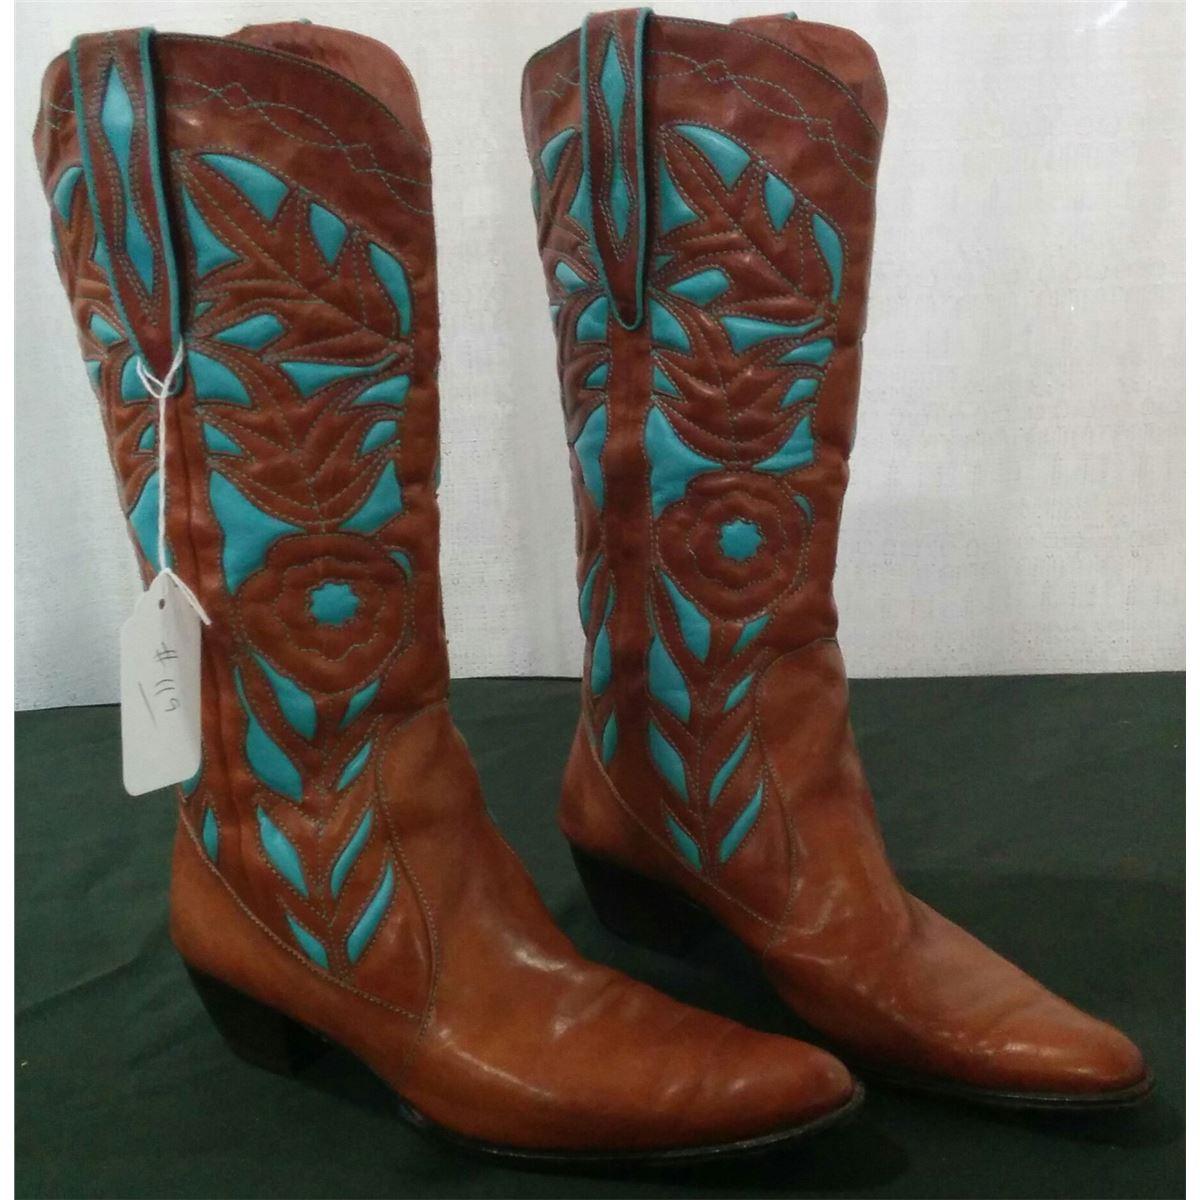 5f6580399ebef2 Vero Cuoio Cowboy Boots. Loading zoom